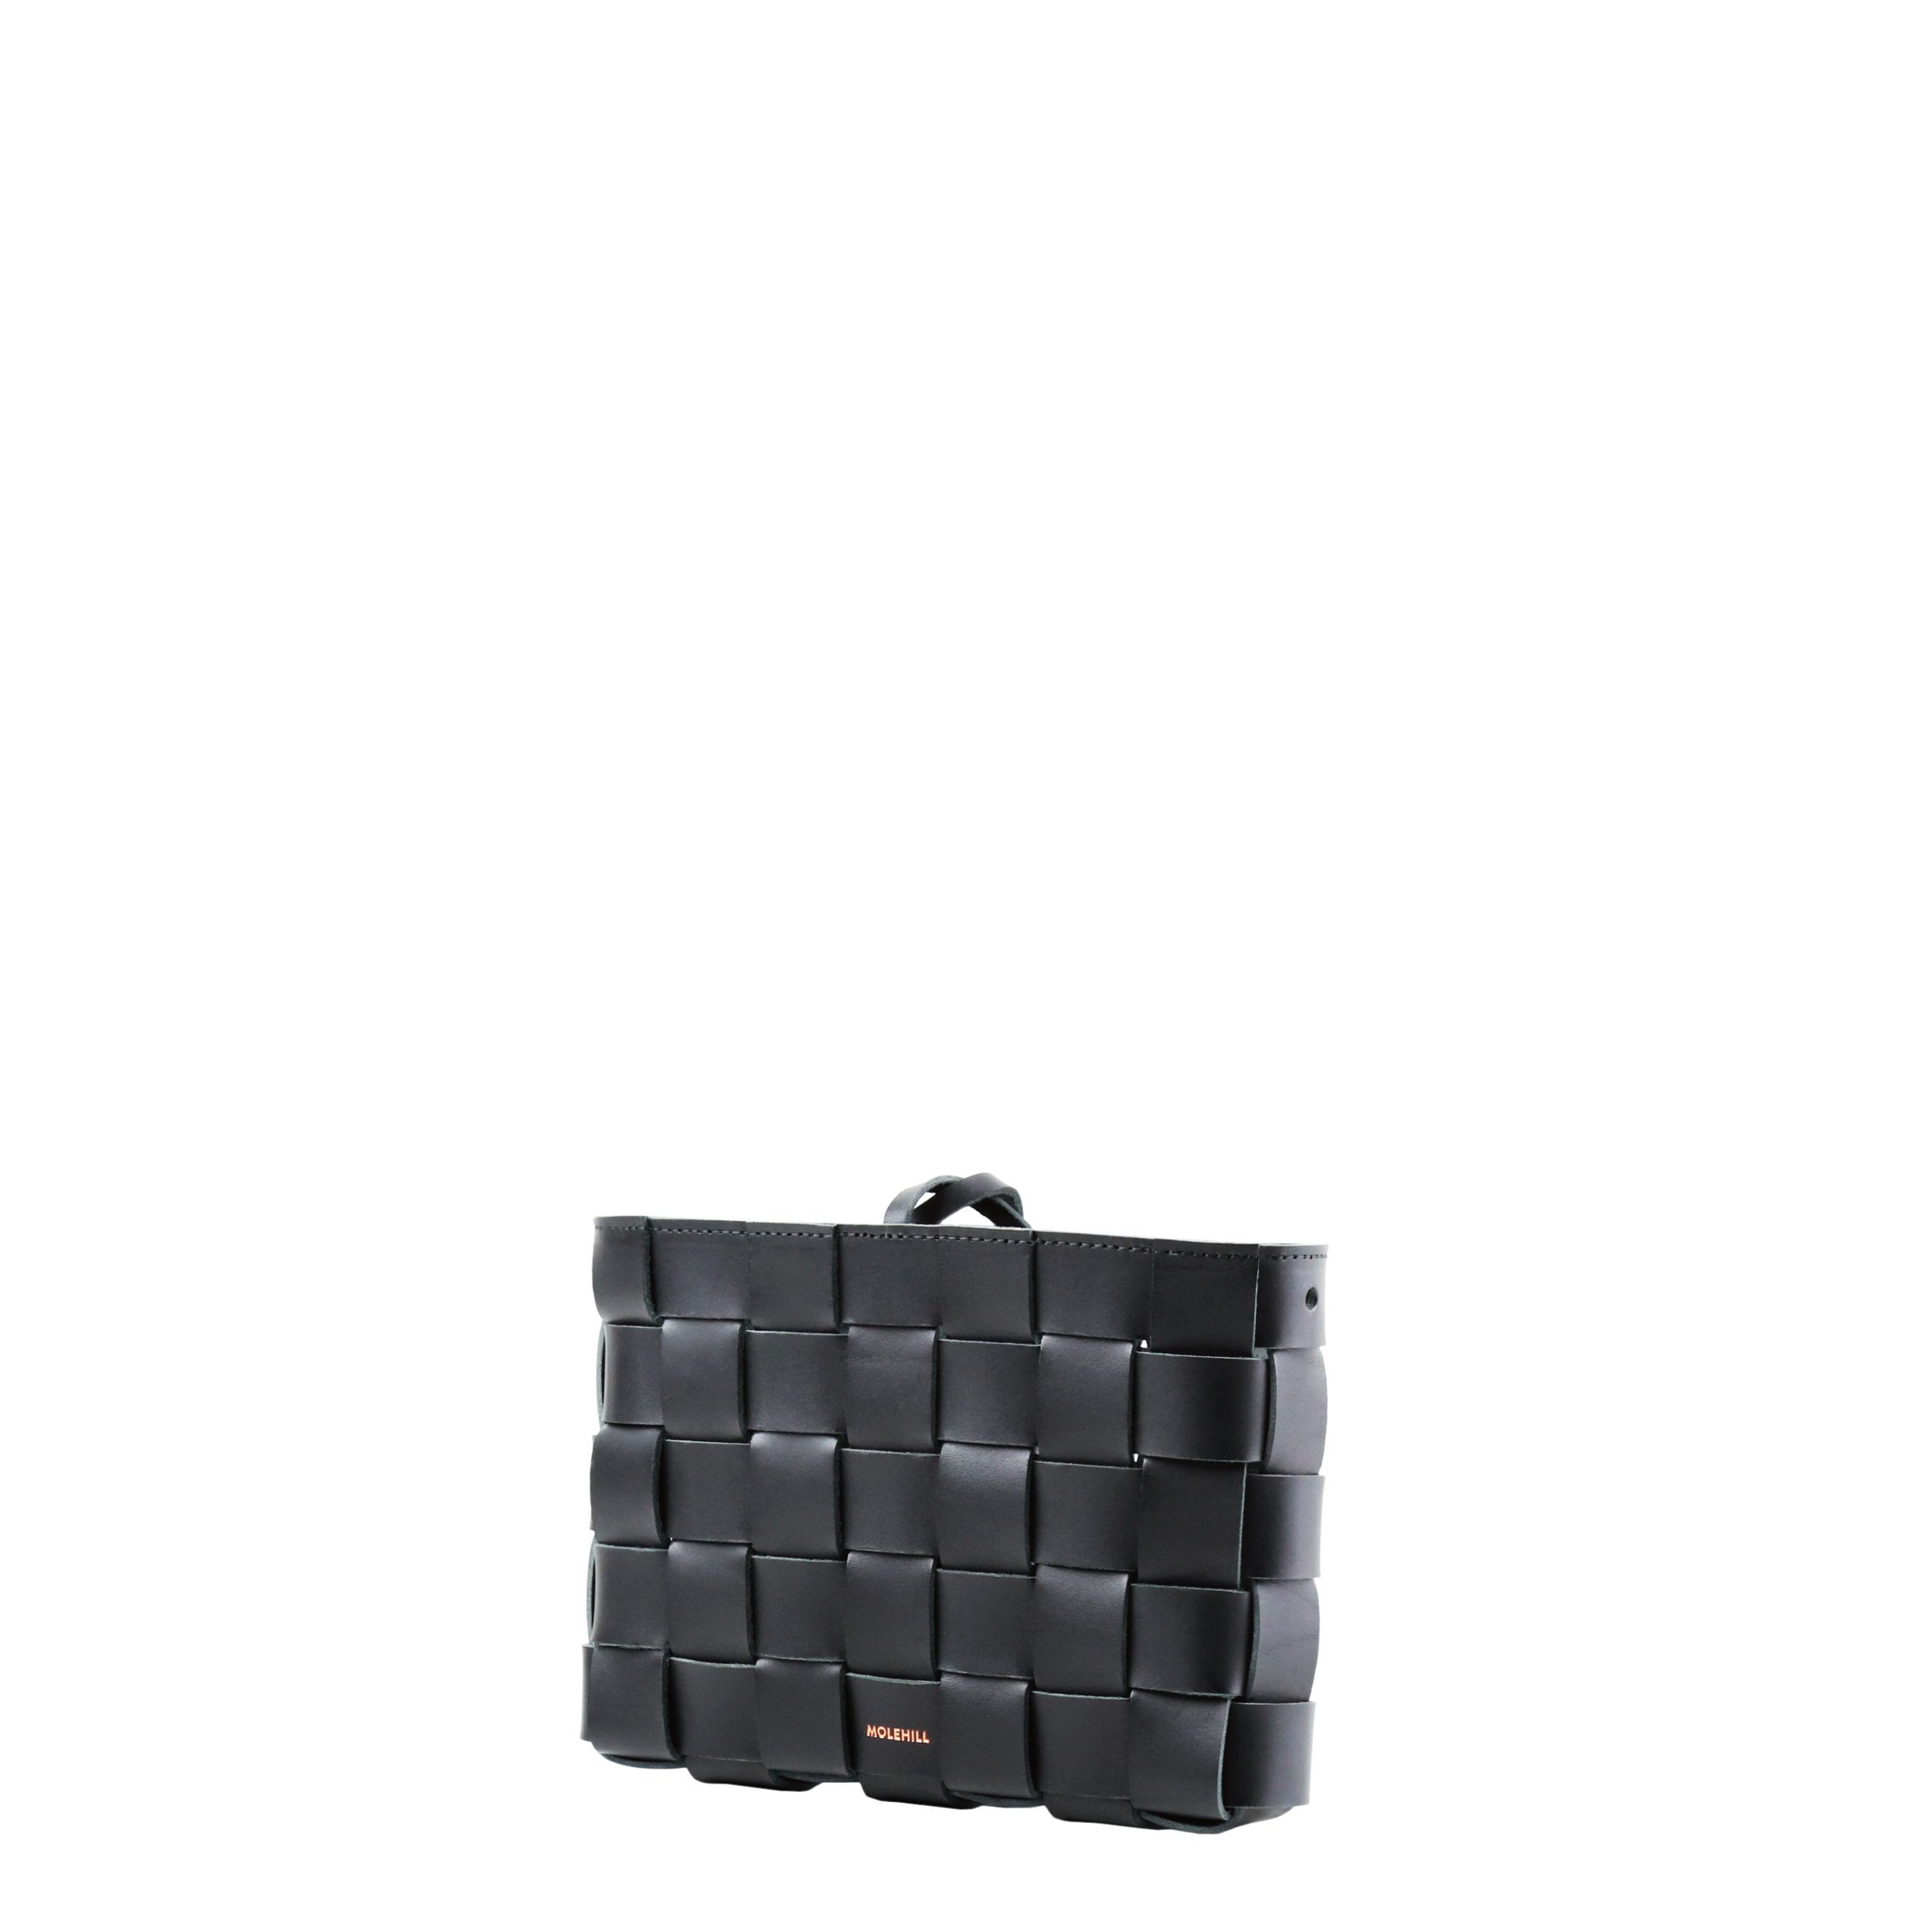 PANE-Crossbody-Bag-Black-4